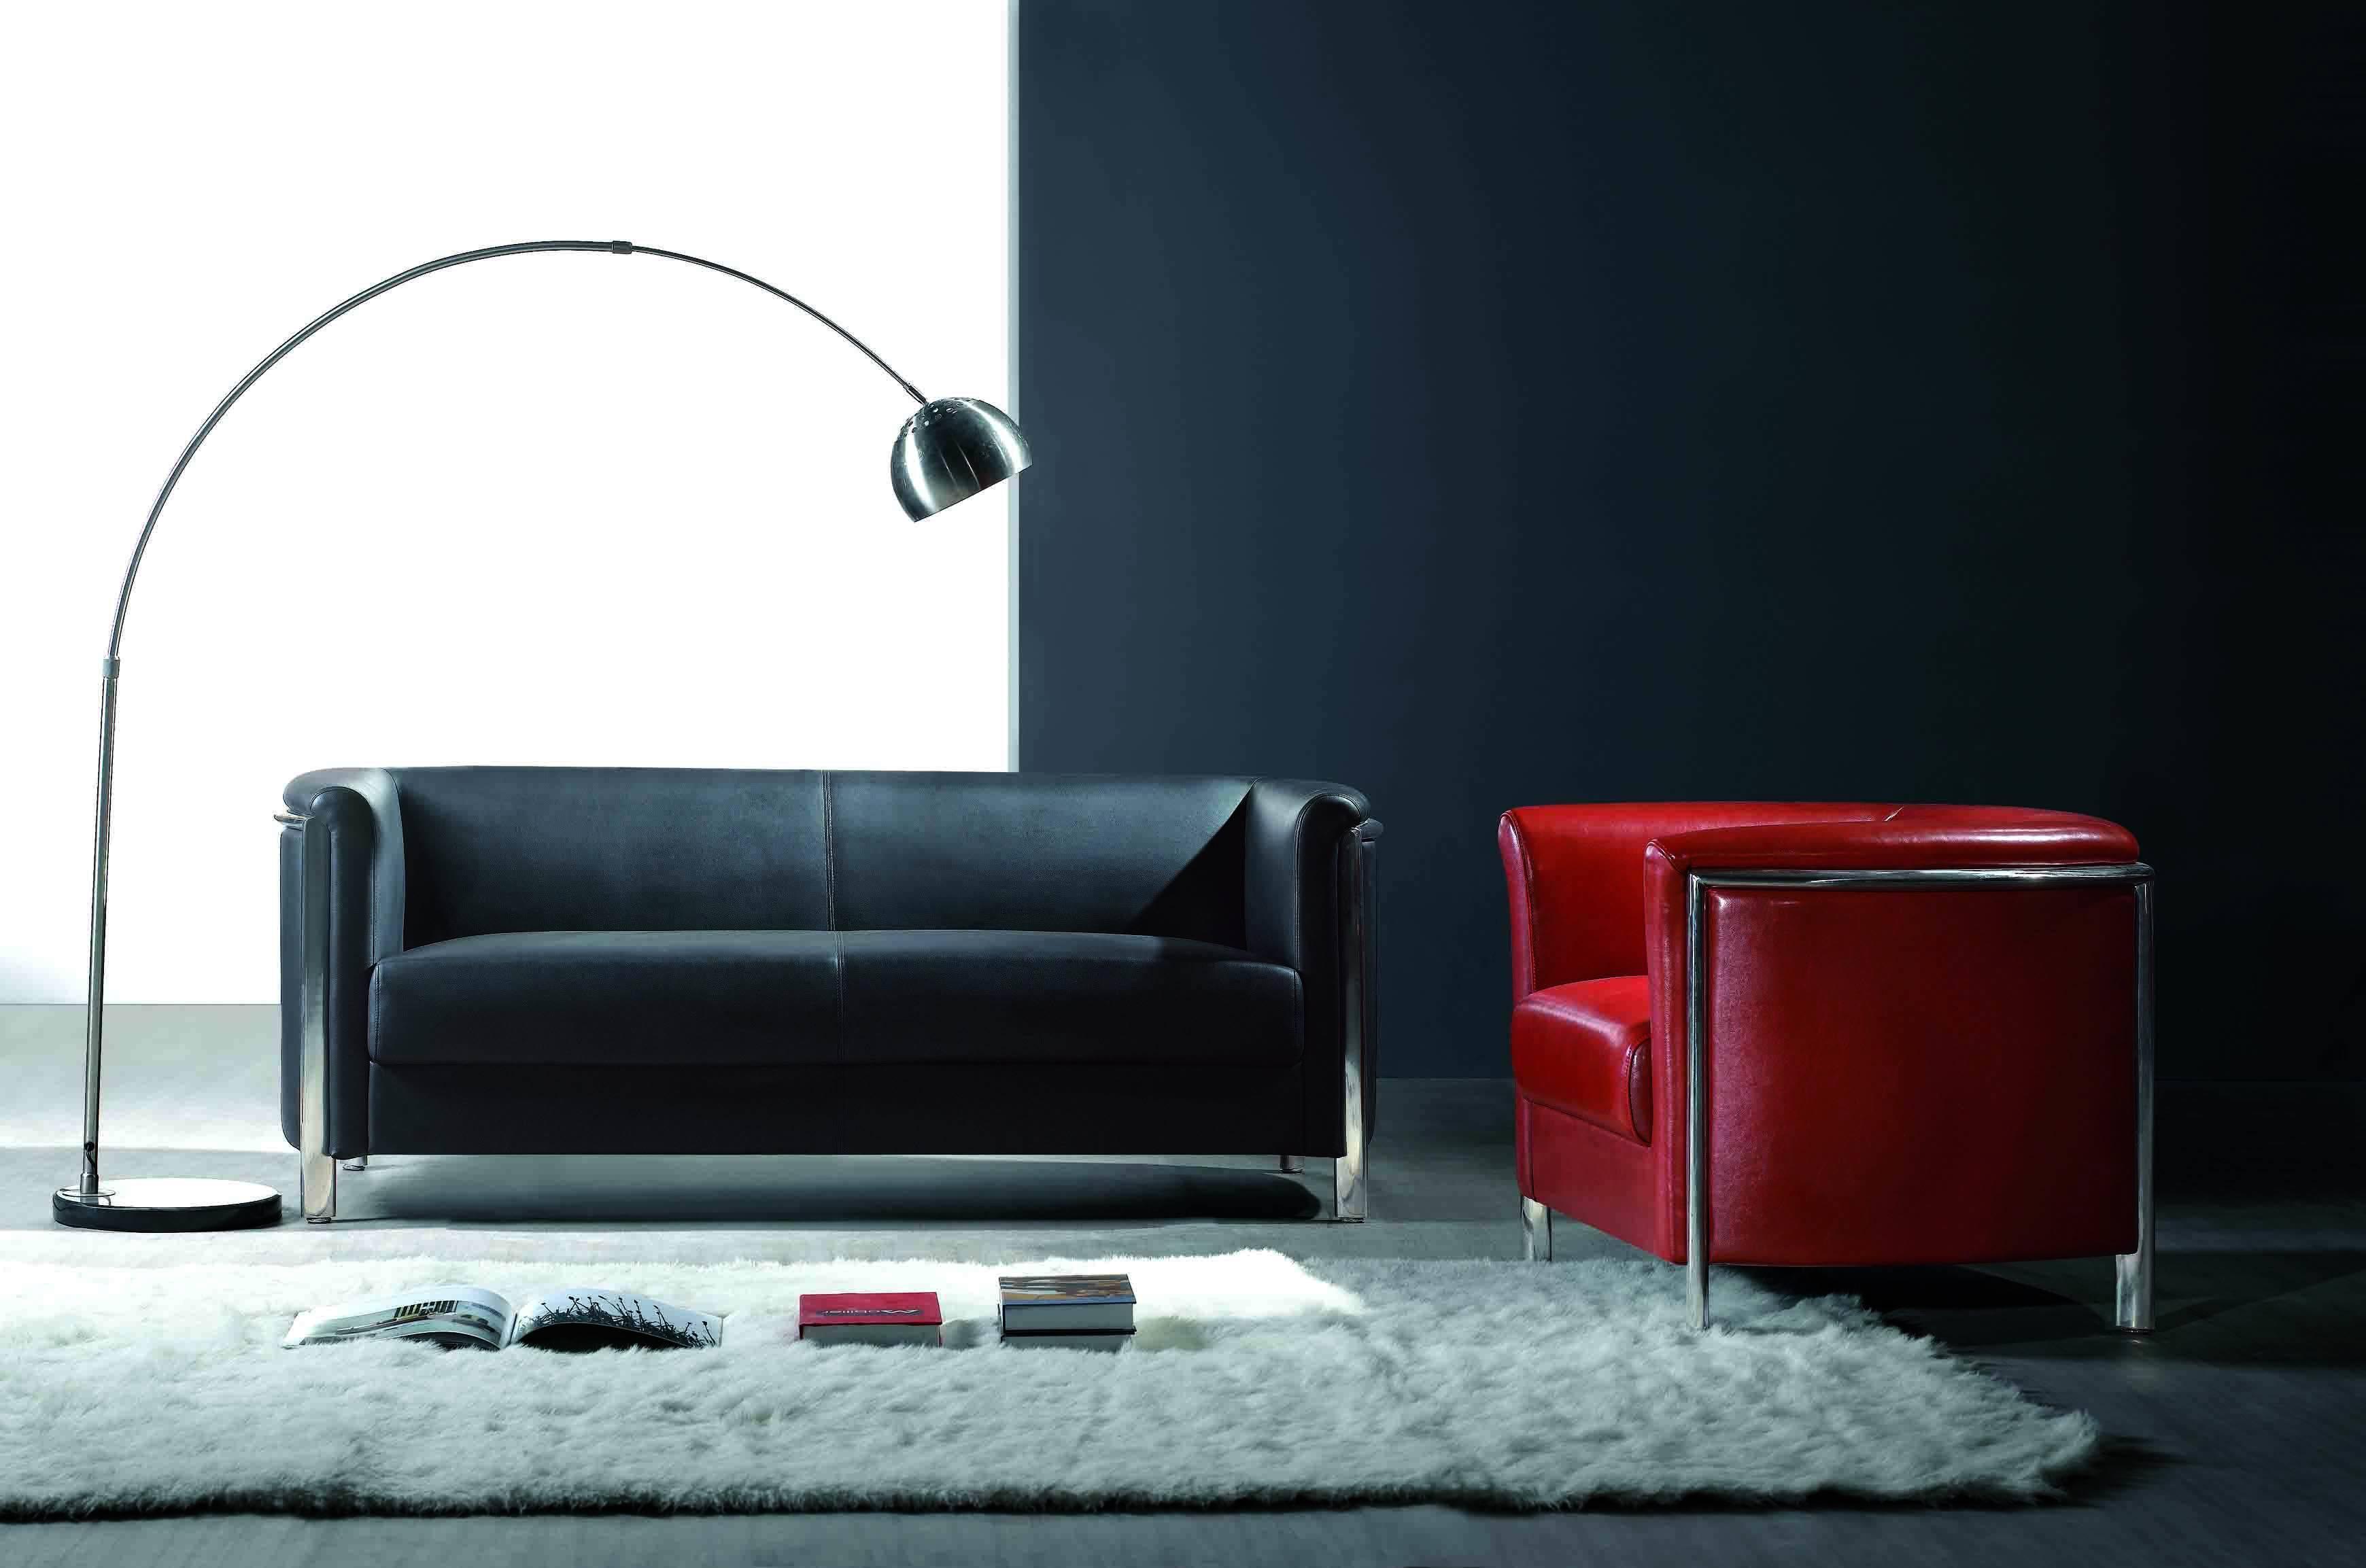 Suites de cuero italiano sof s sillones sof s muebles vida - Sillones de diseno italiano ...